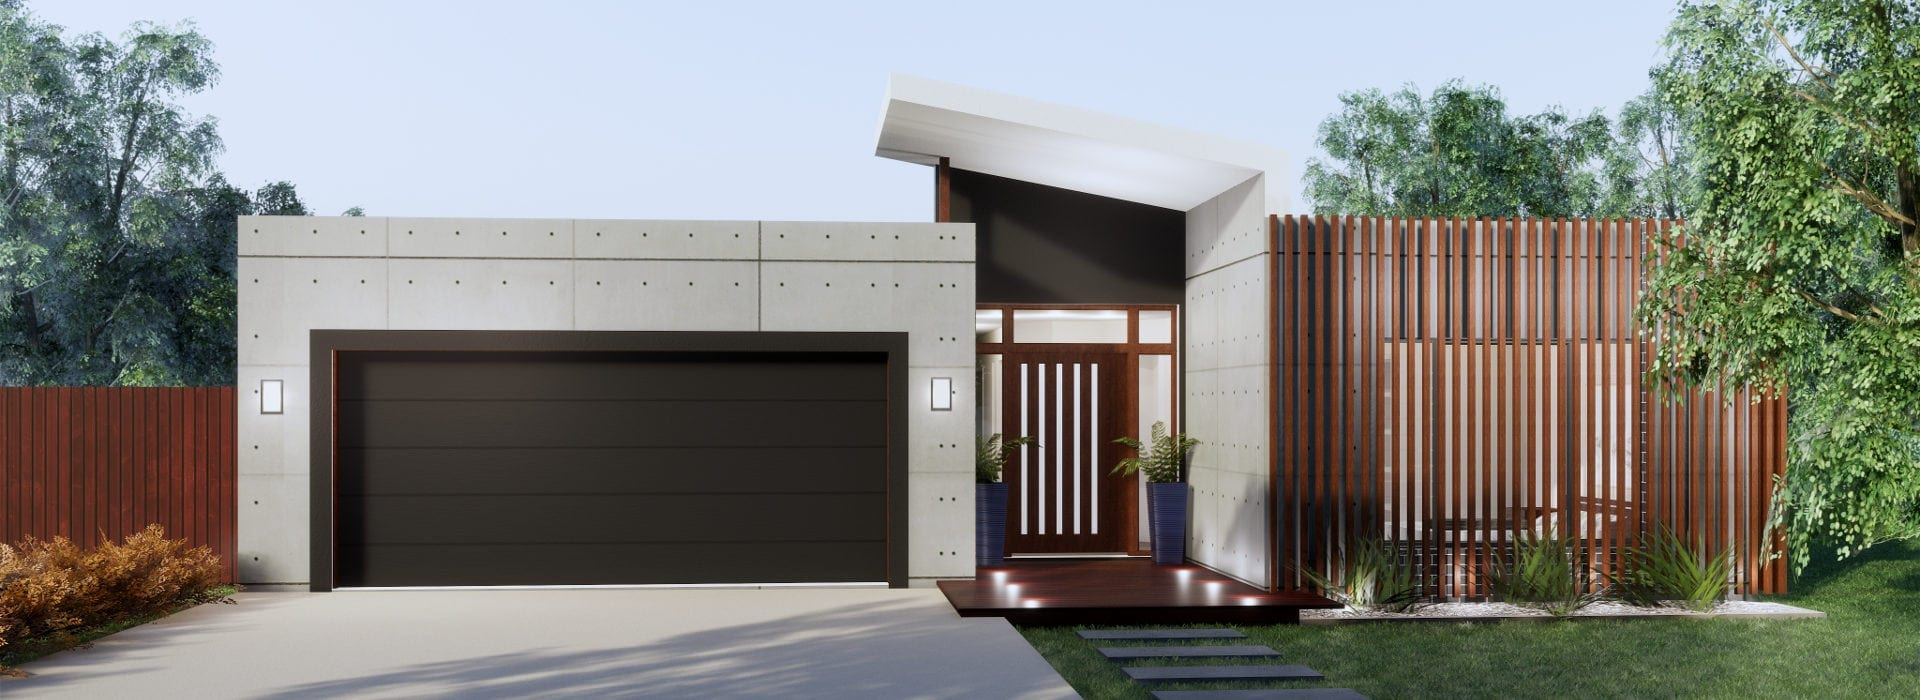 Modern House Designs House Plans Arei Designs